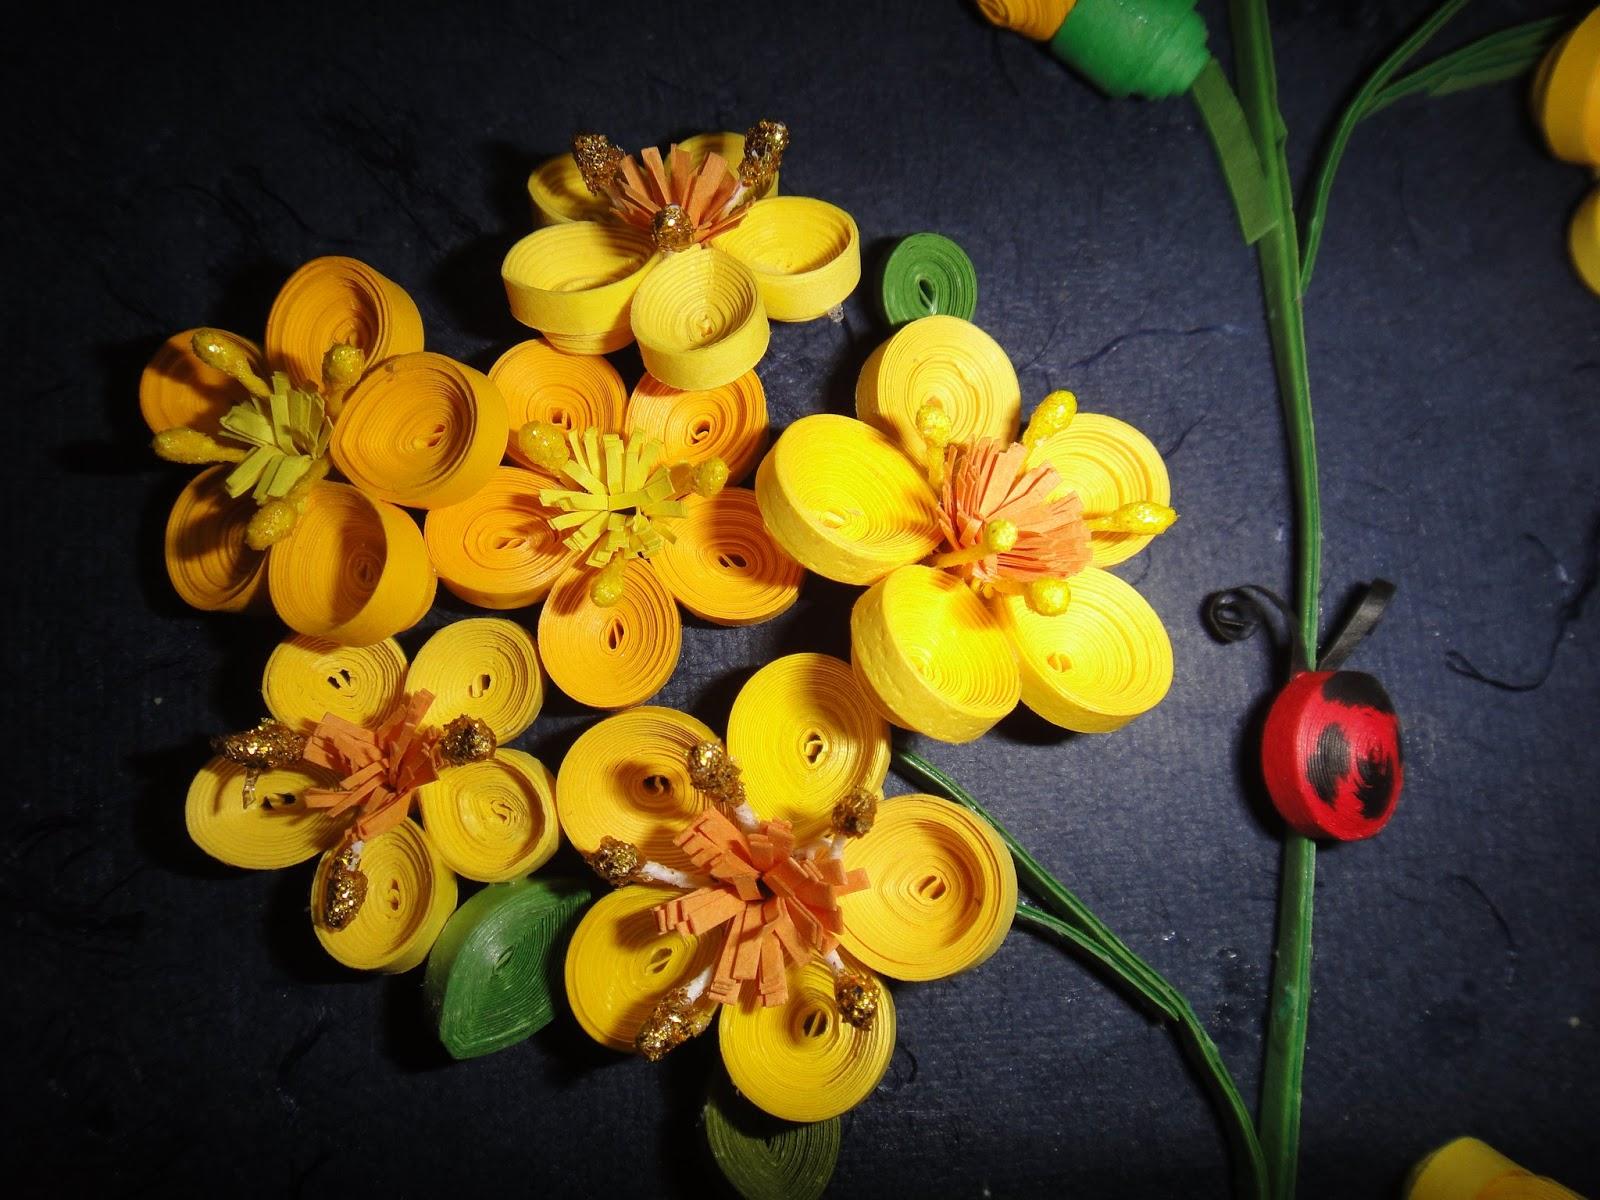 Wall frame - Paper Quilling Flower - Creative Art & Craft Work